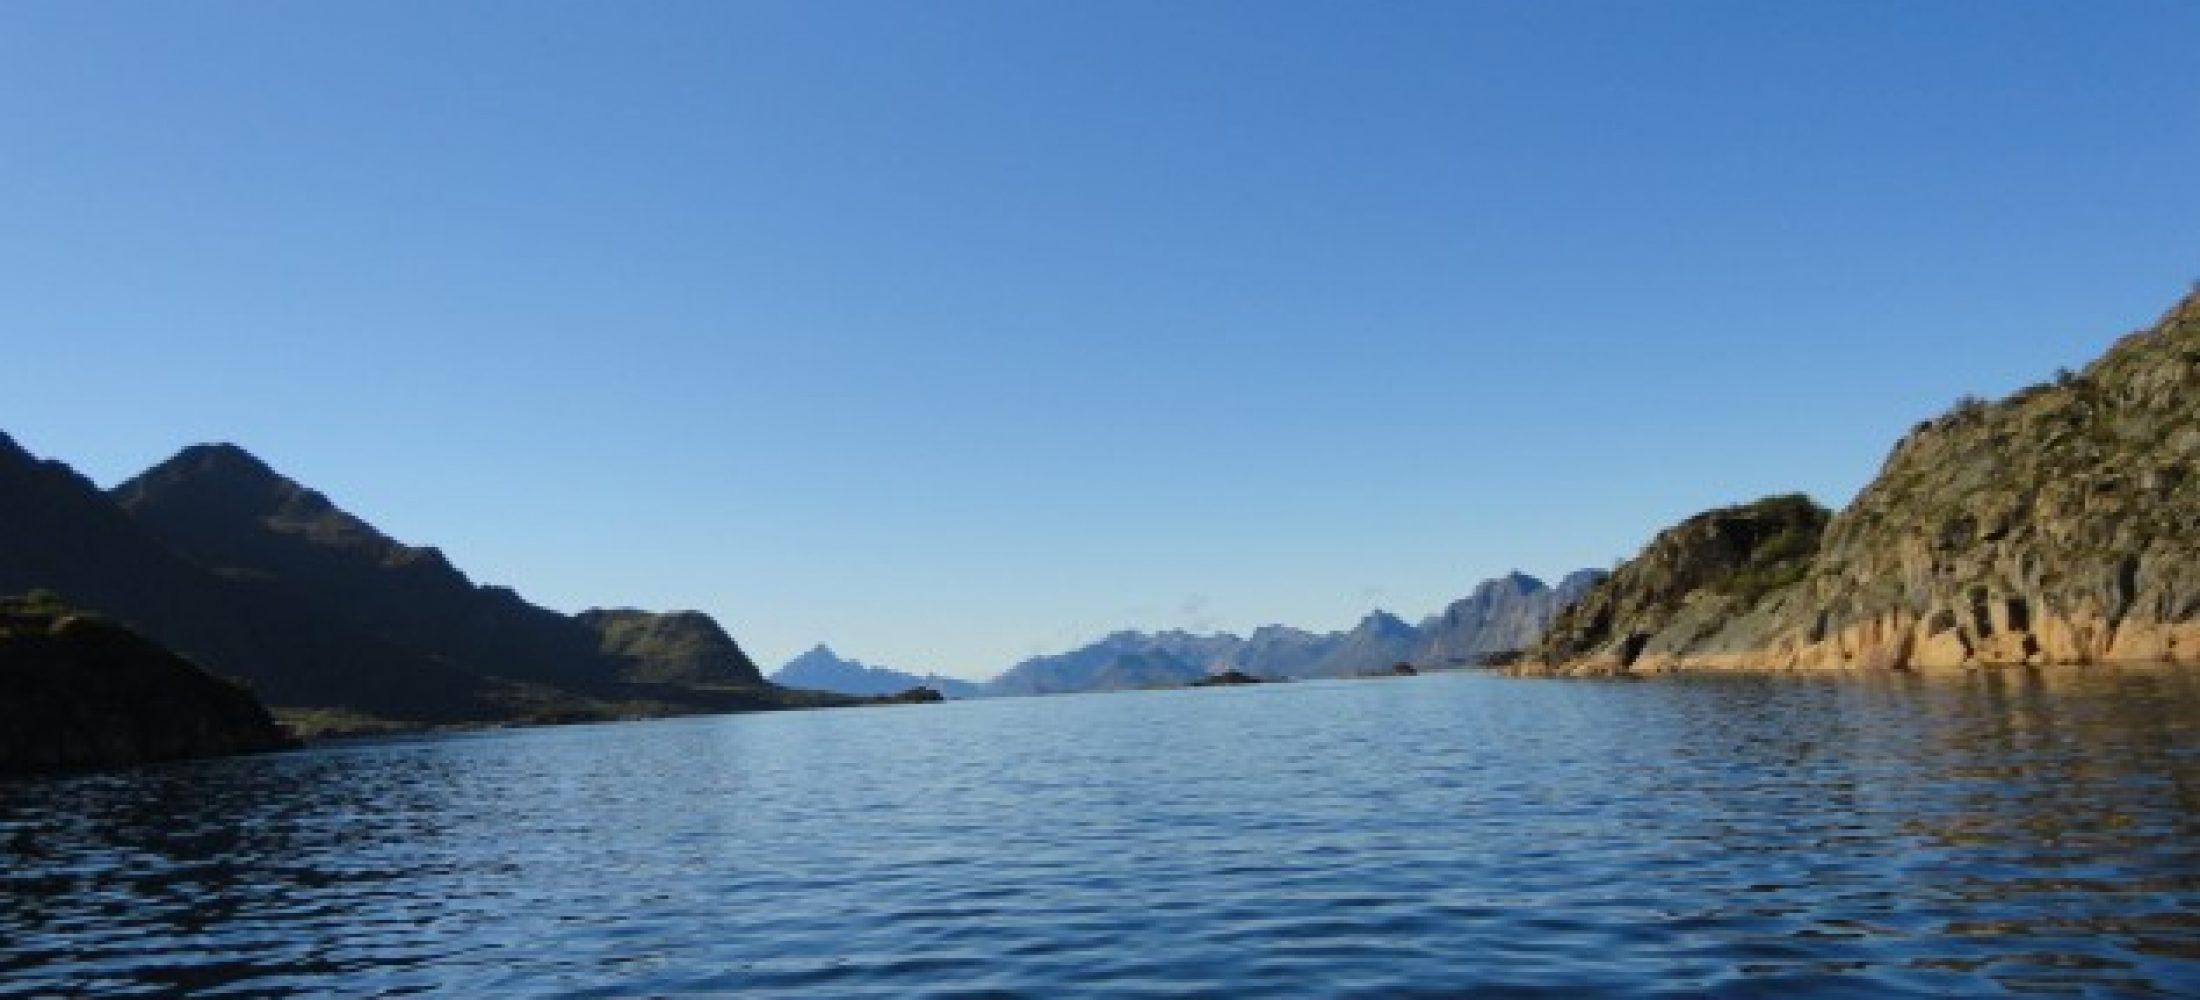 Raftsundet on a clear day